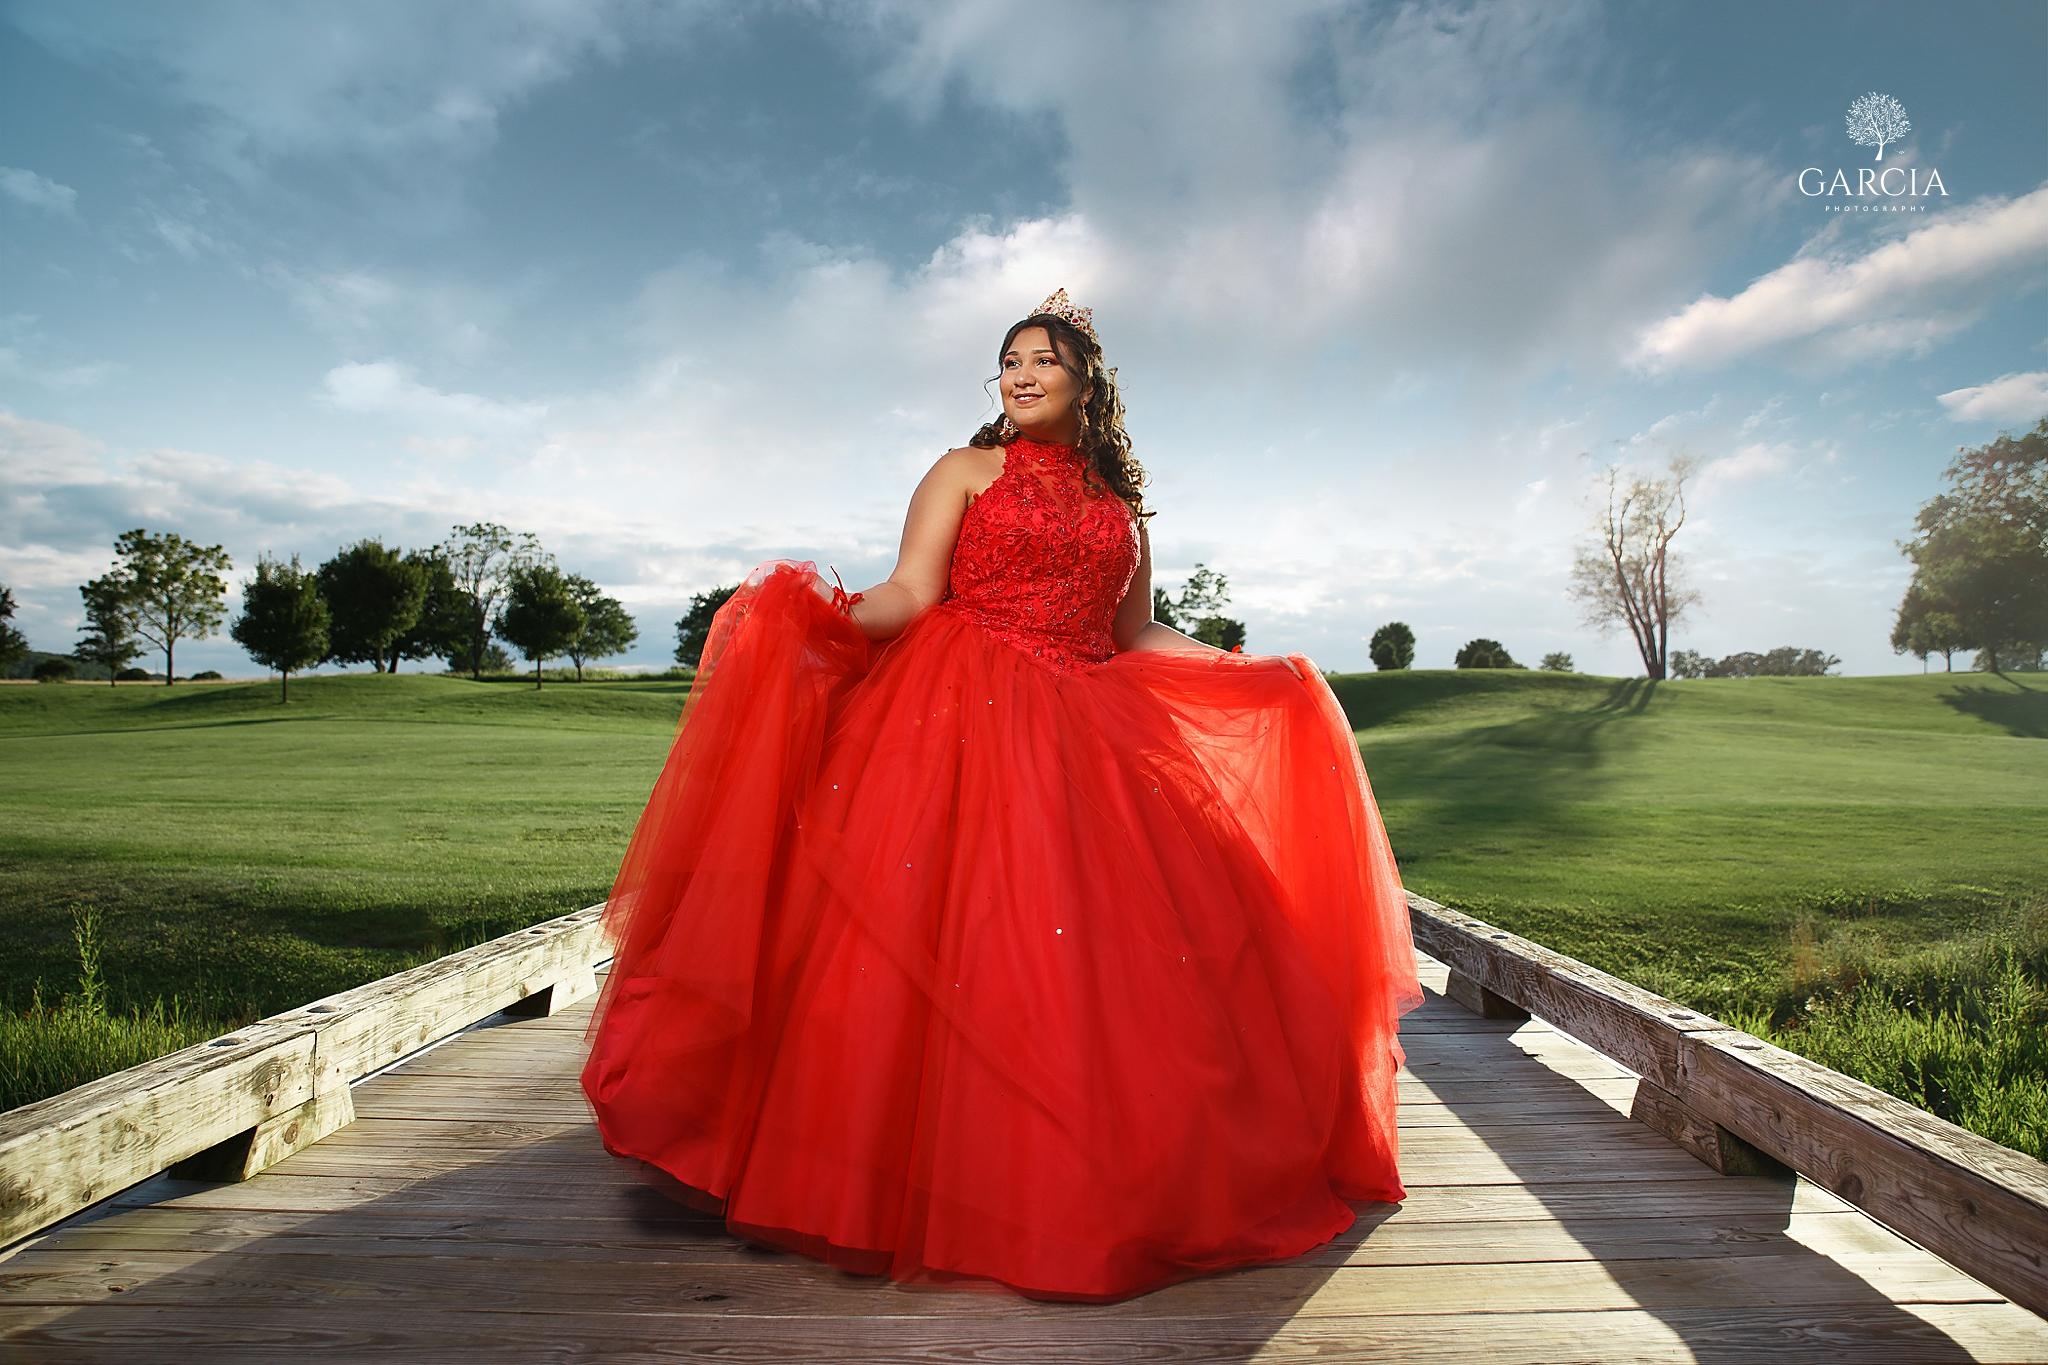 Anjali-Sweet-16-Garcia-Photography-6287.jpg